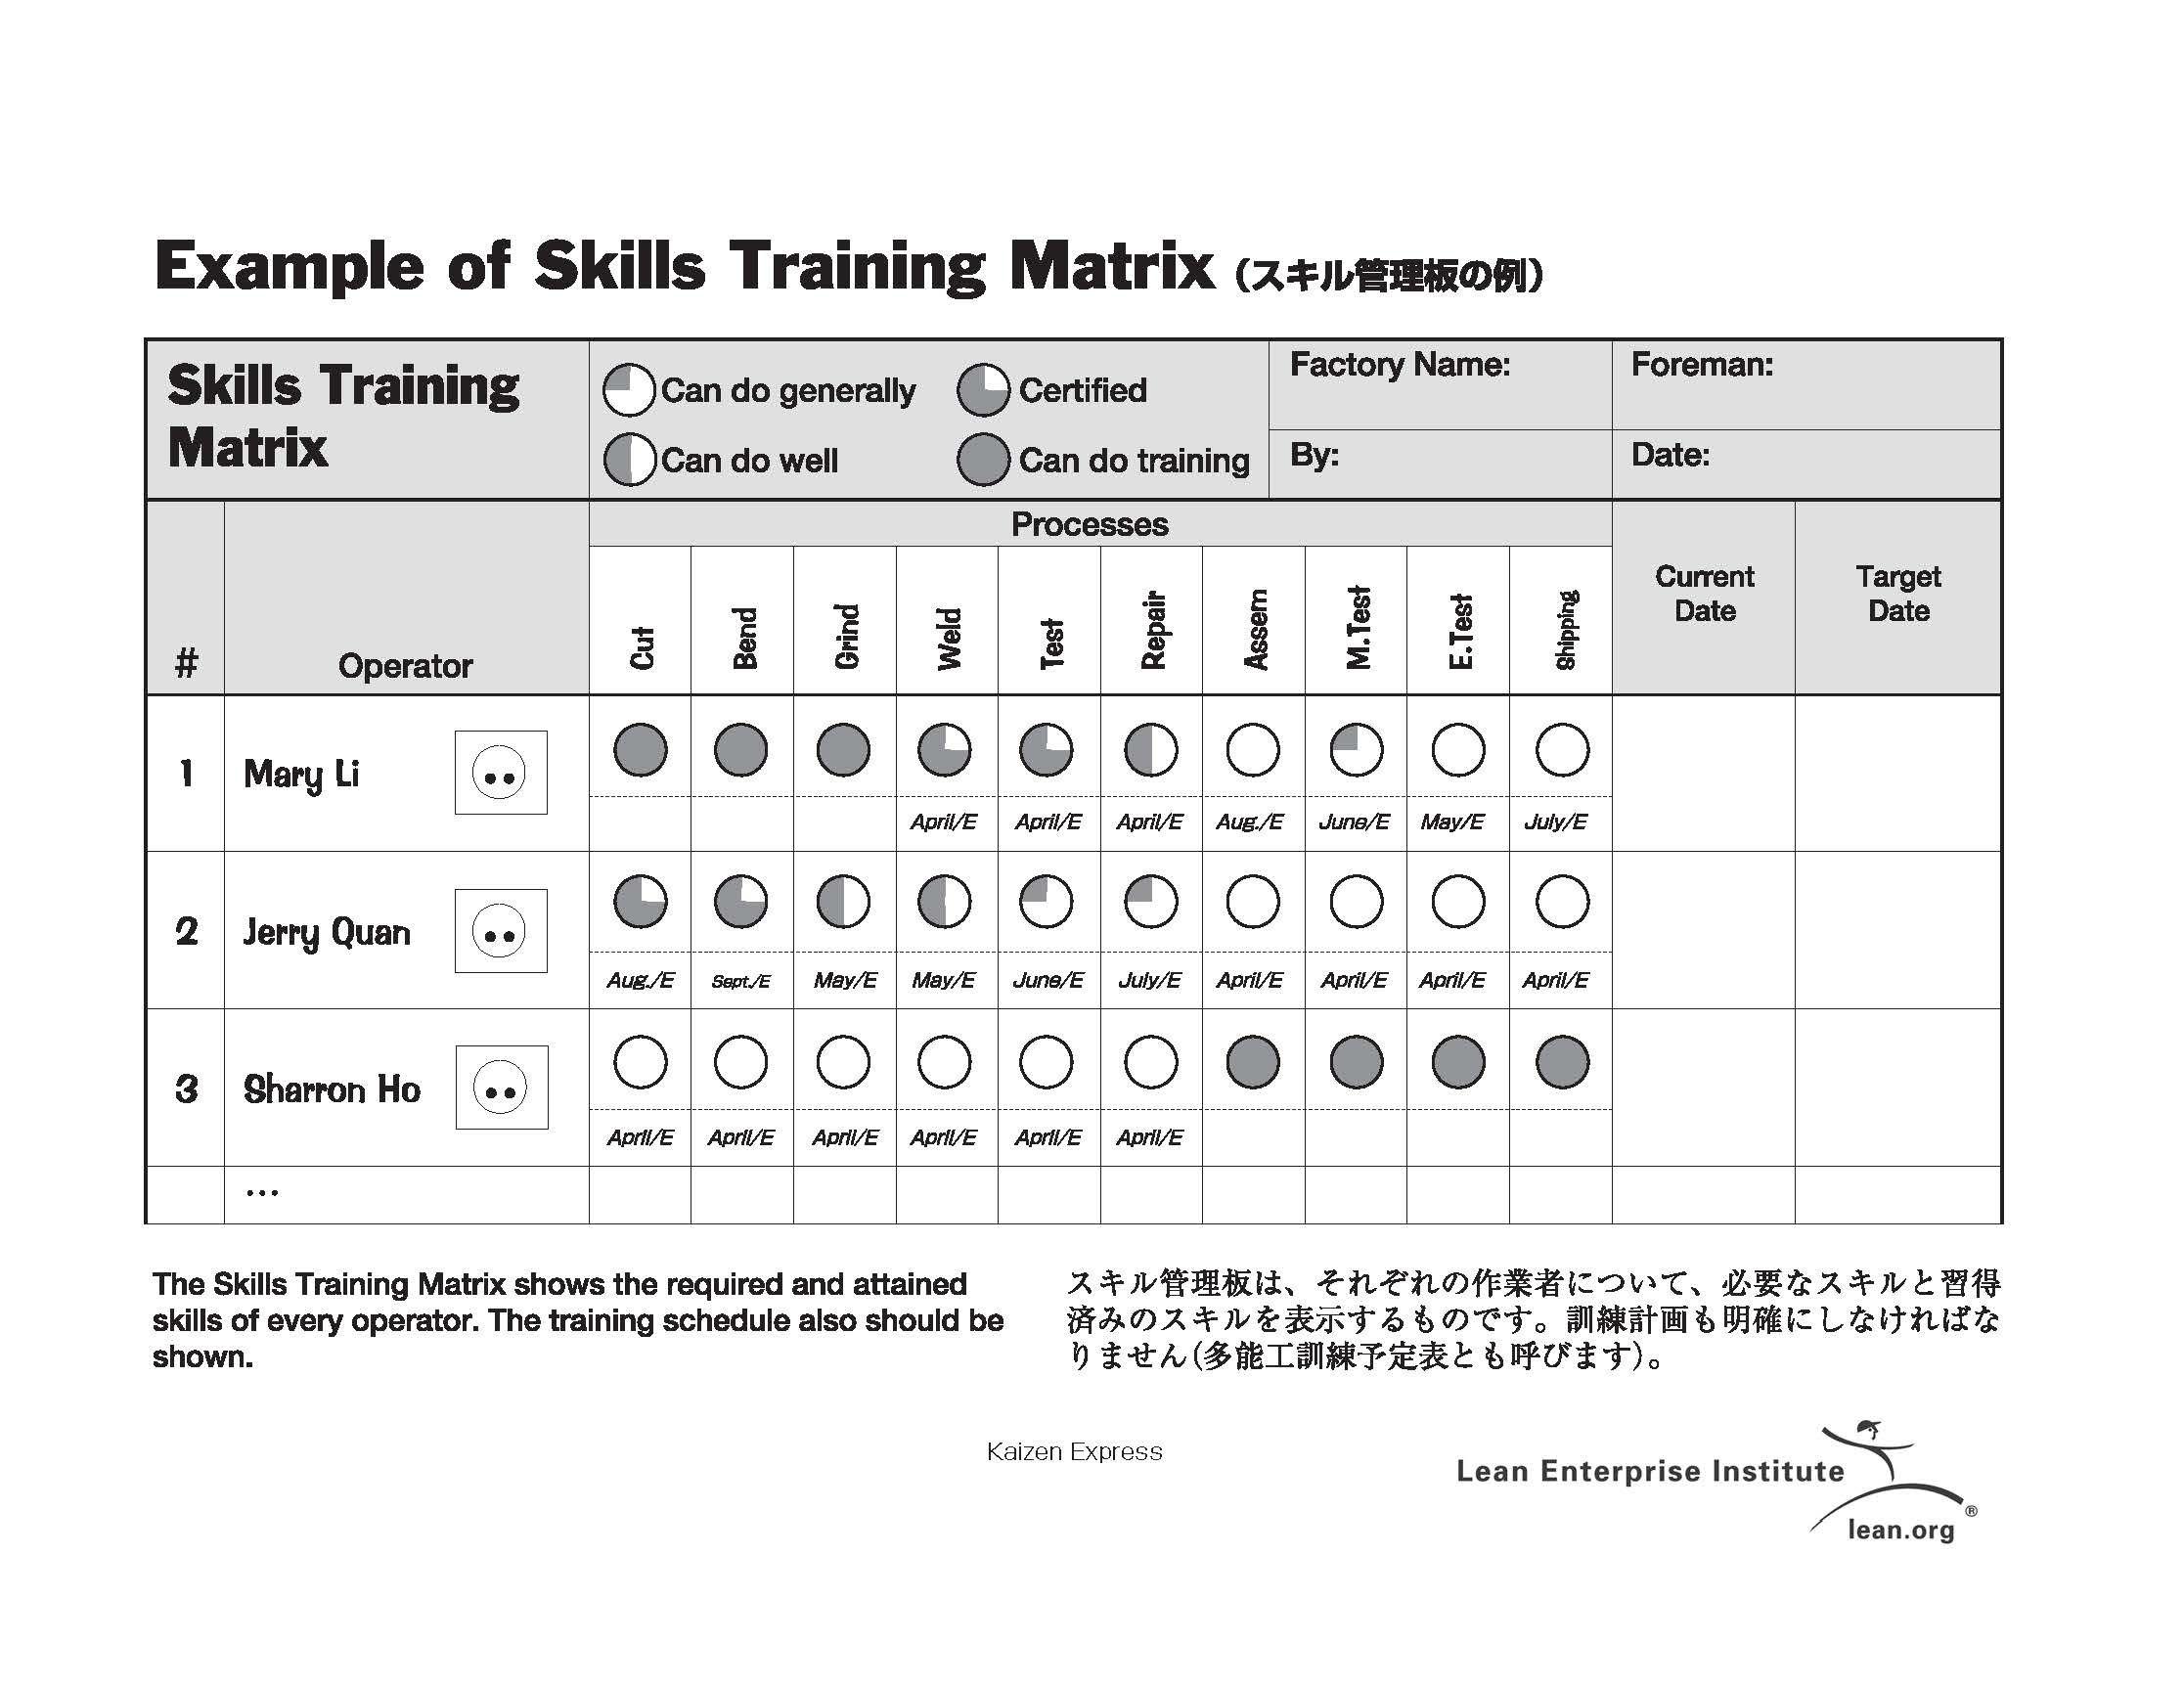 Skills Training Matrix Visual Management Training And Development Skill Training